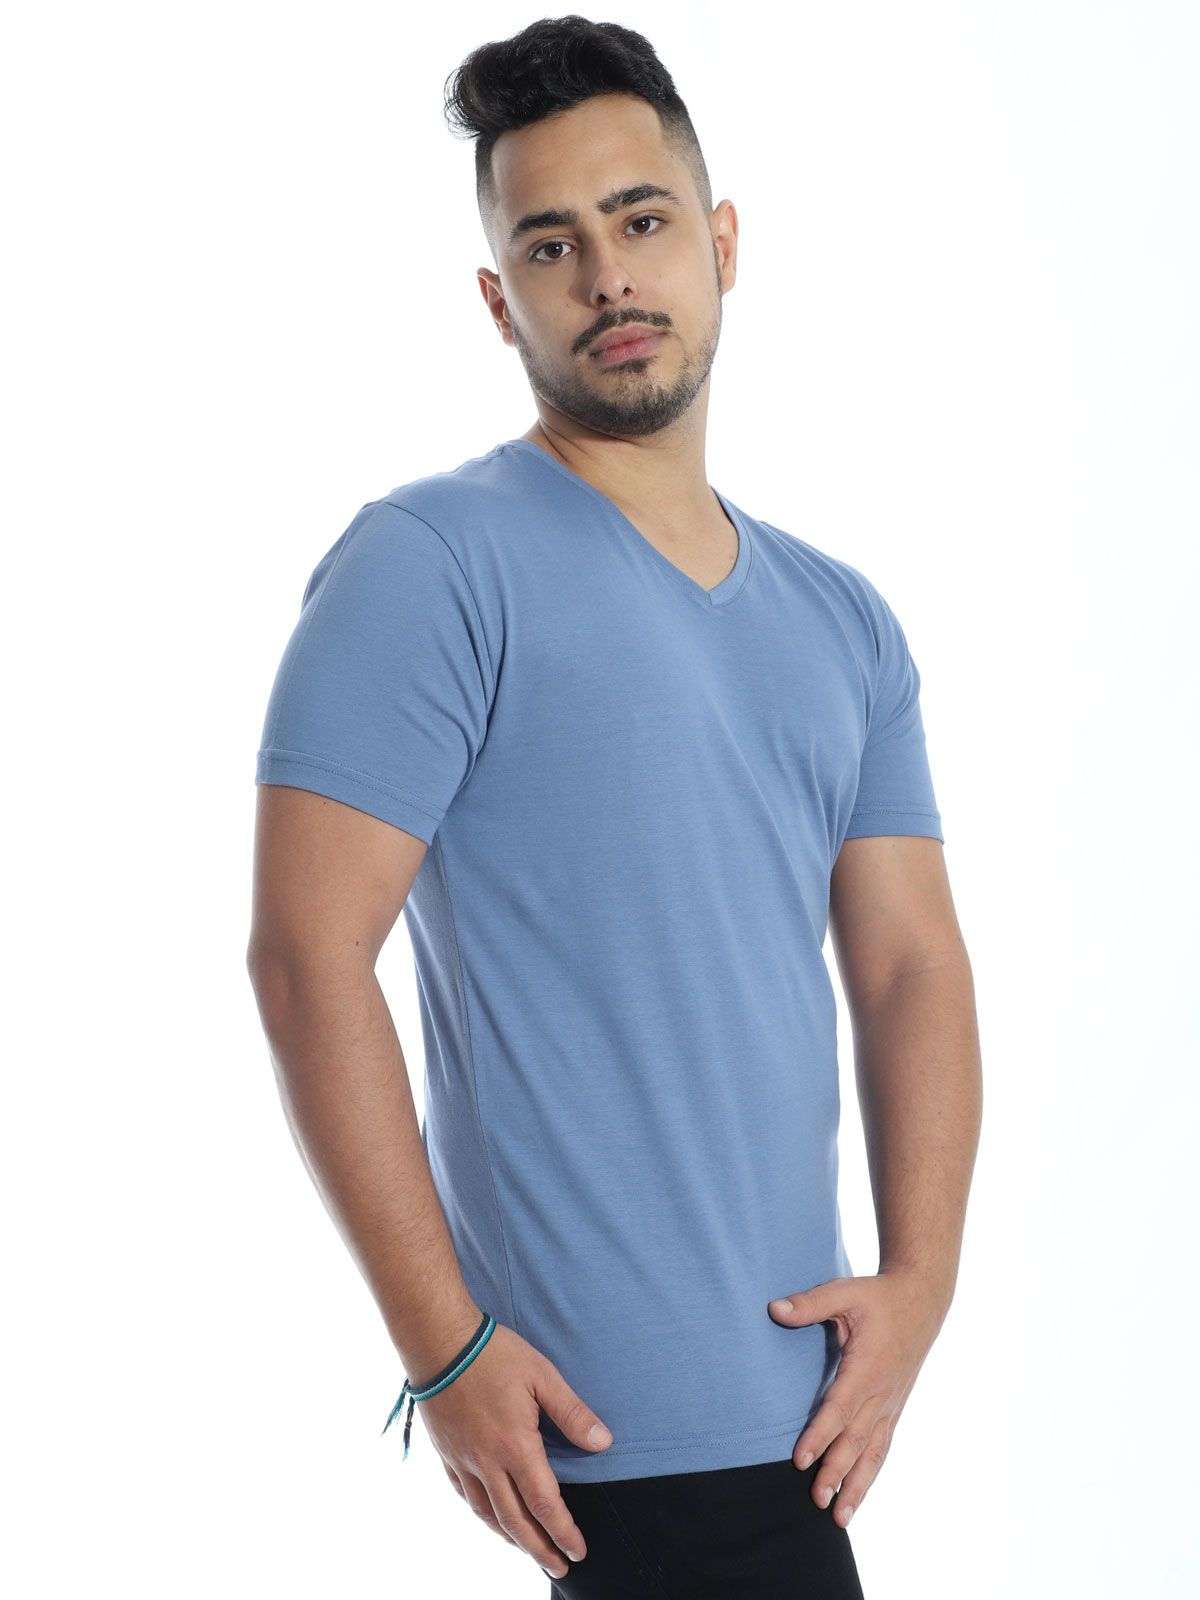 Camiseta Anistia Slim Fit Decote V. Lisa Indigo